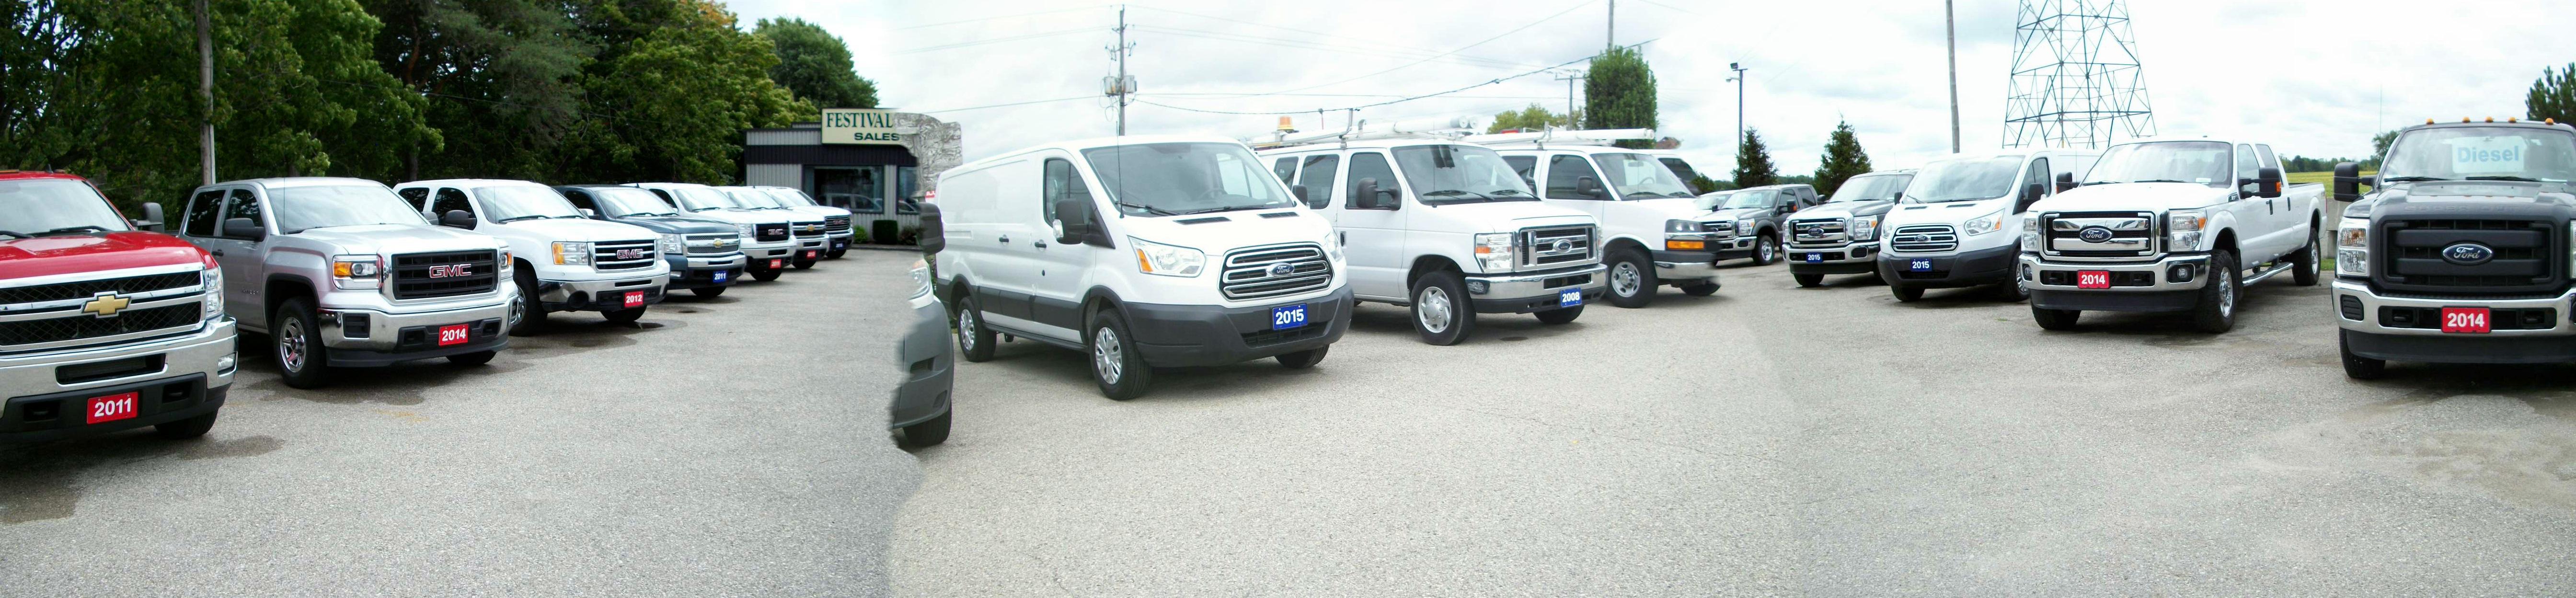 Cargo Vans Cube Vans Commercial Trucks Festival City